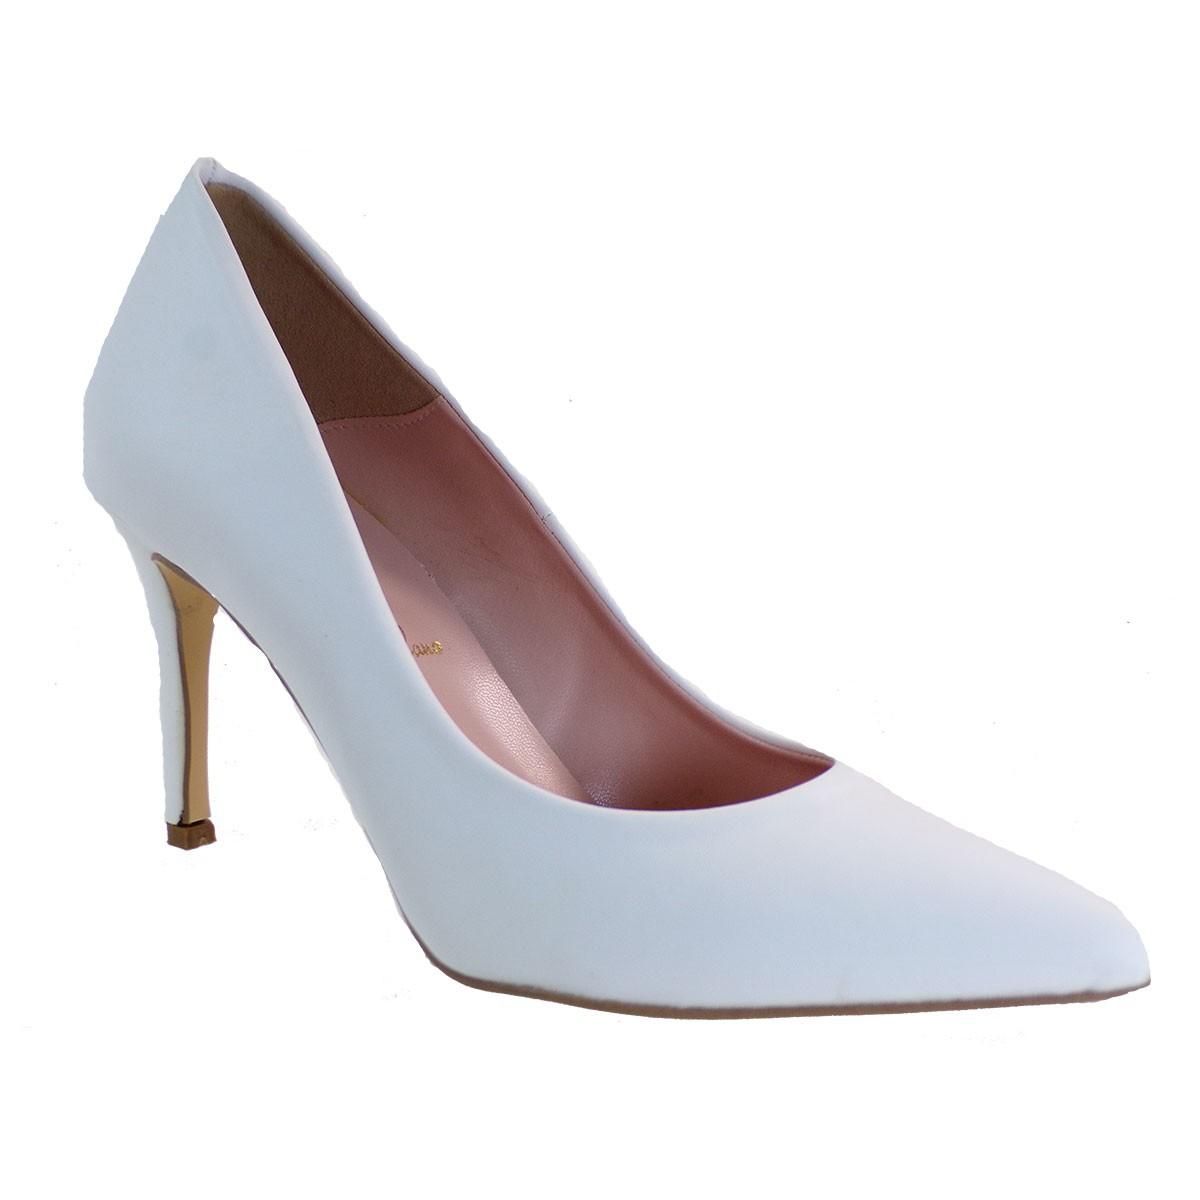 Alessandra Paggioti Γυναικεία Παπούτσια Γόβες 81001 Λευκό Mατ